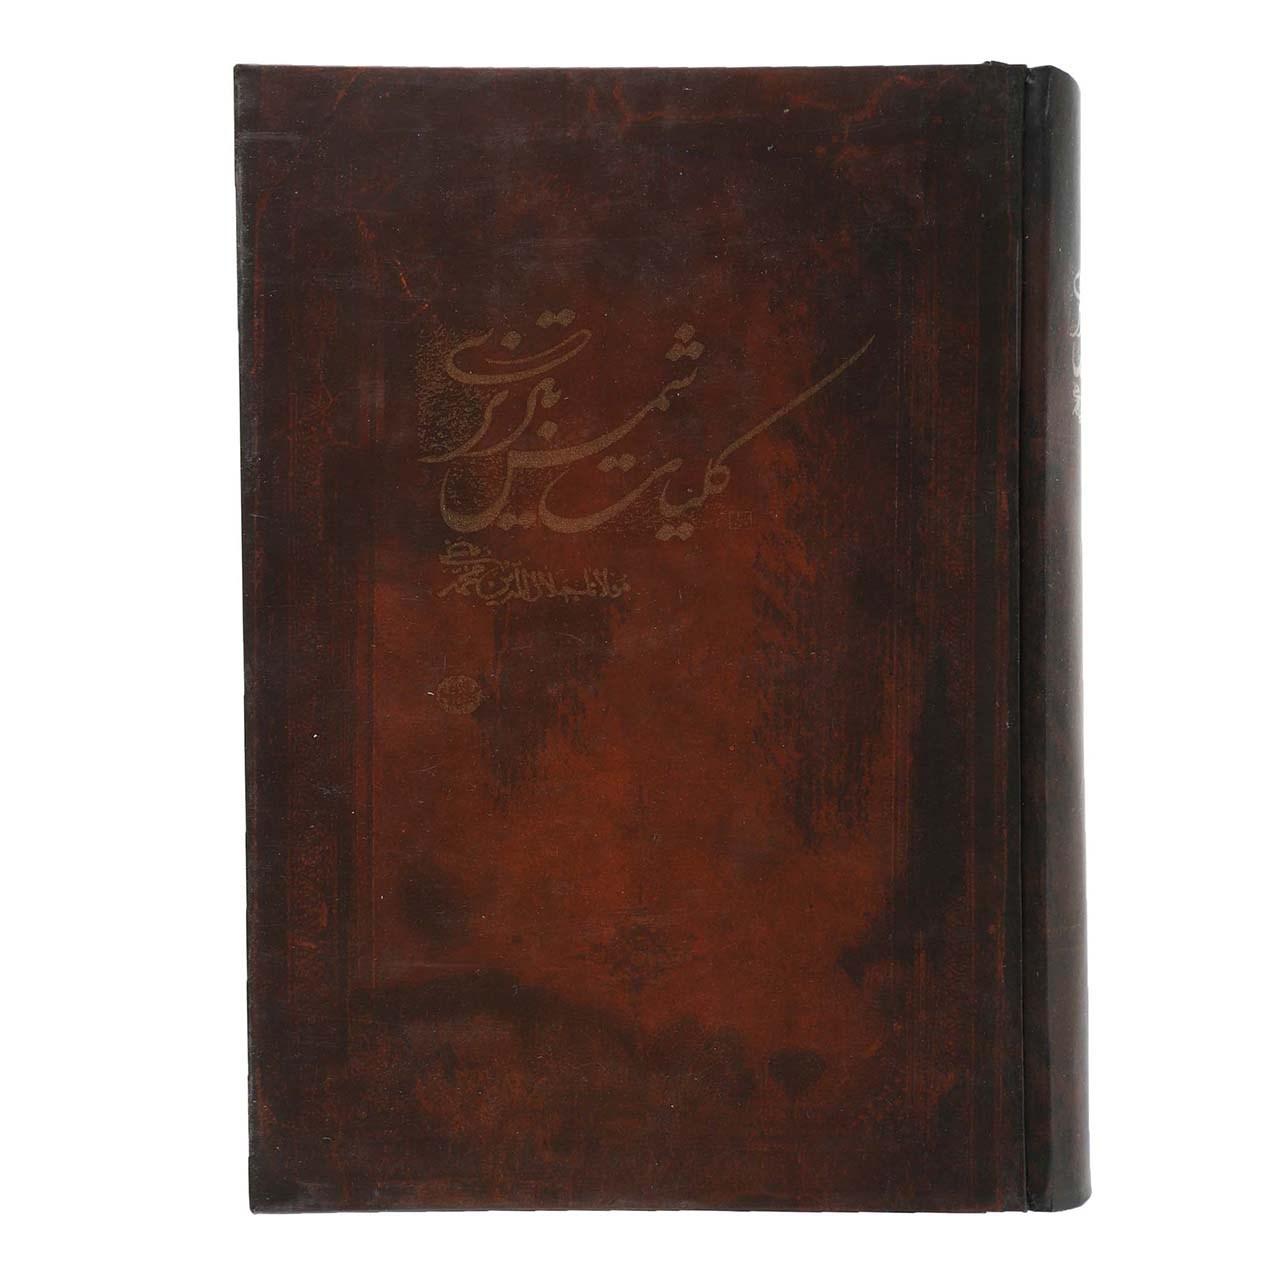 کتاب کلیات شمس تبریزی  اثر مولانا جلال الدین محمد بلخی